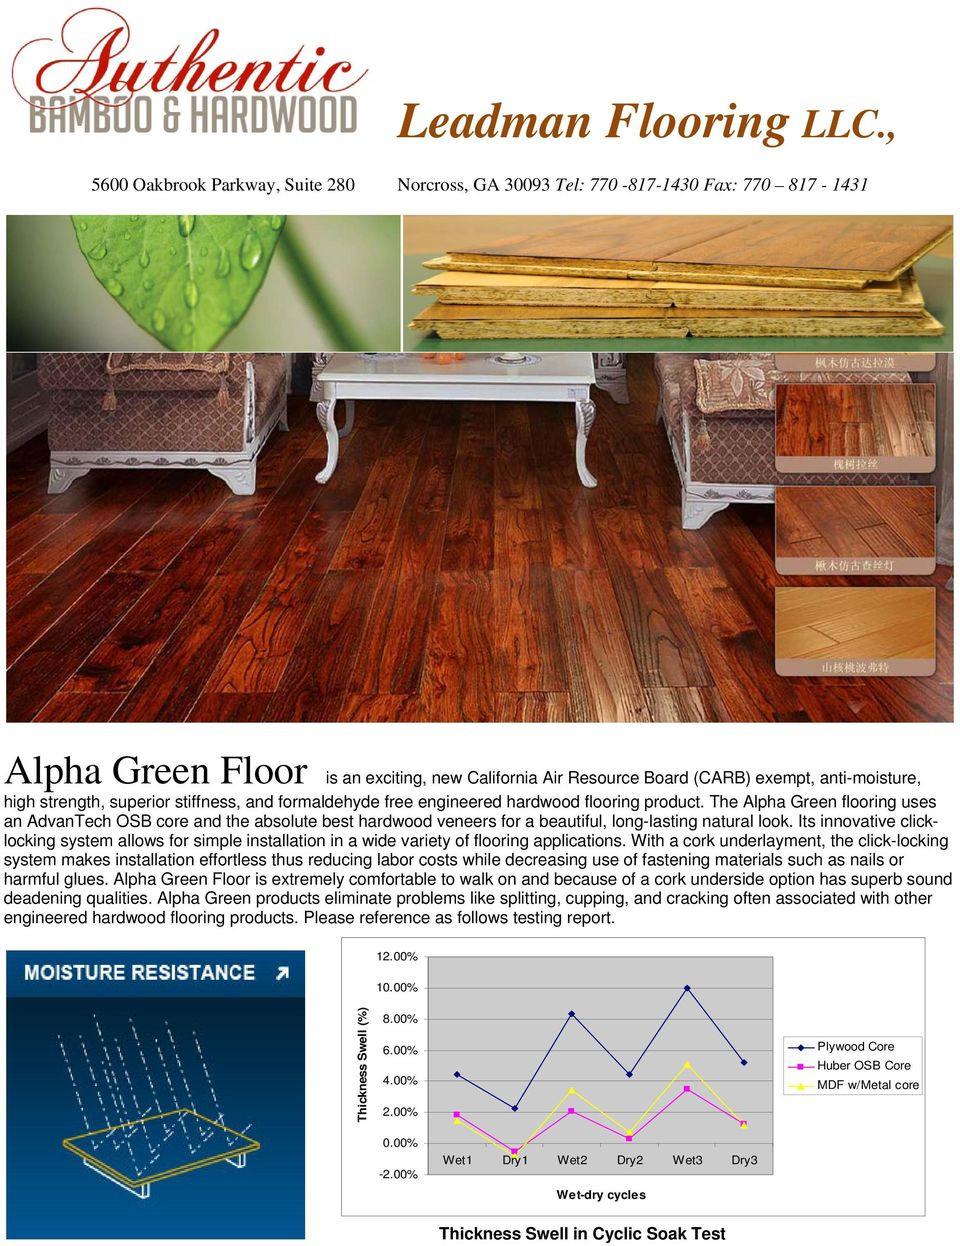 glue nail or float hardwood floor of leadman flooring llc pdf inside strength superior stiffness and formaldehyde free engineered hardwood flooring product